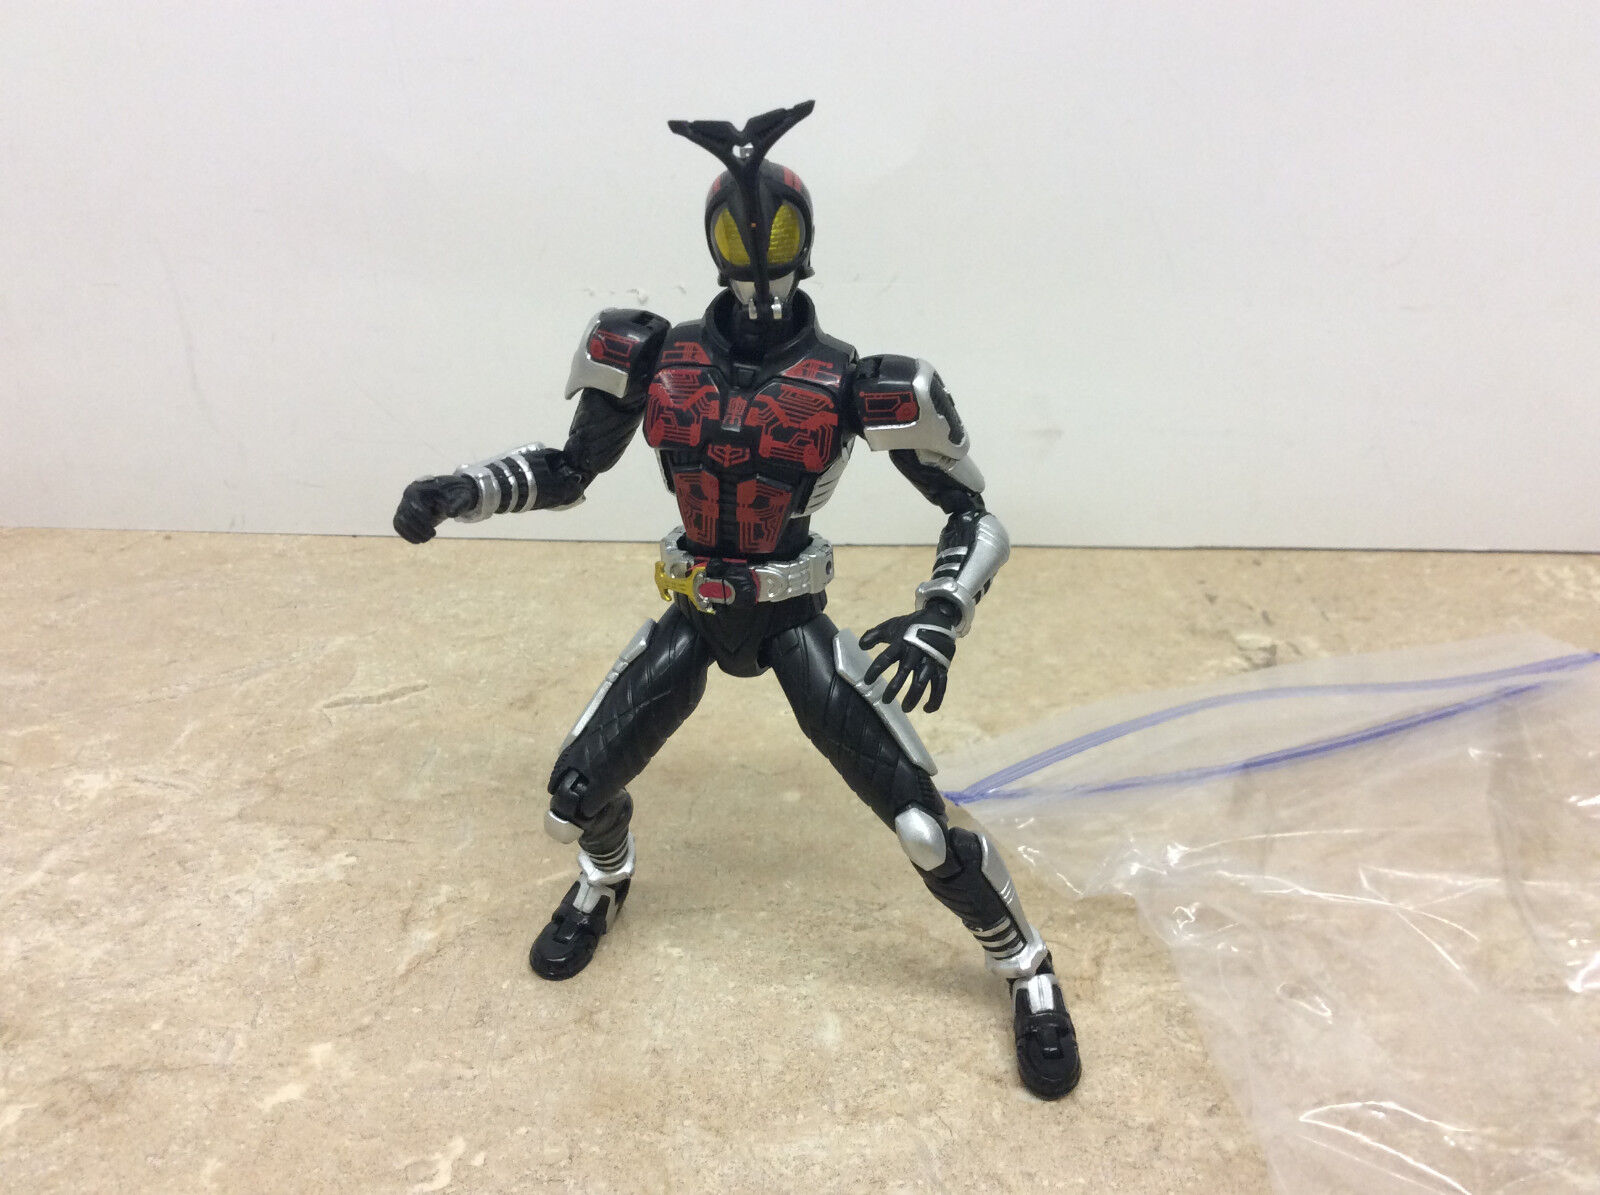 Bandai S.H.Figuarts Kamen Rider Masked Rider Dark Kabuto Figure & Accessories